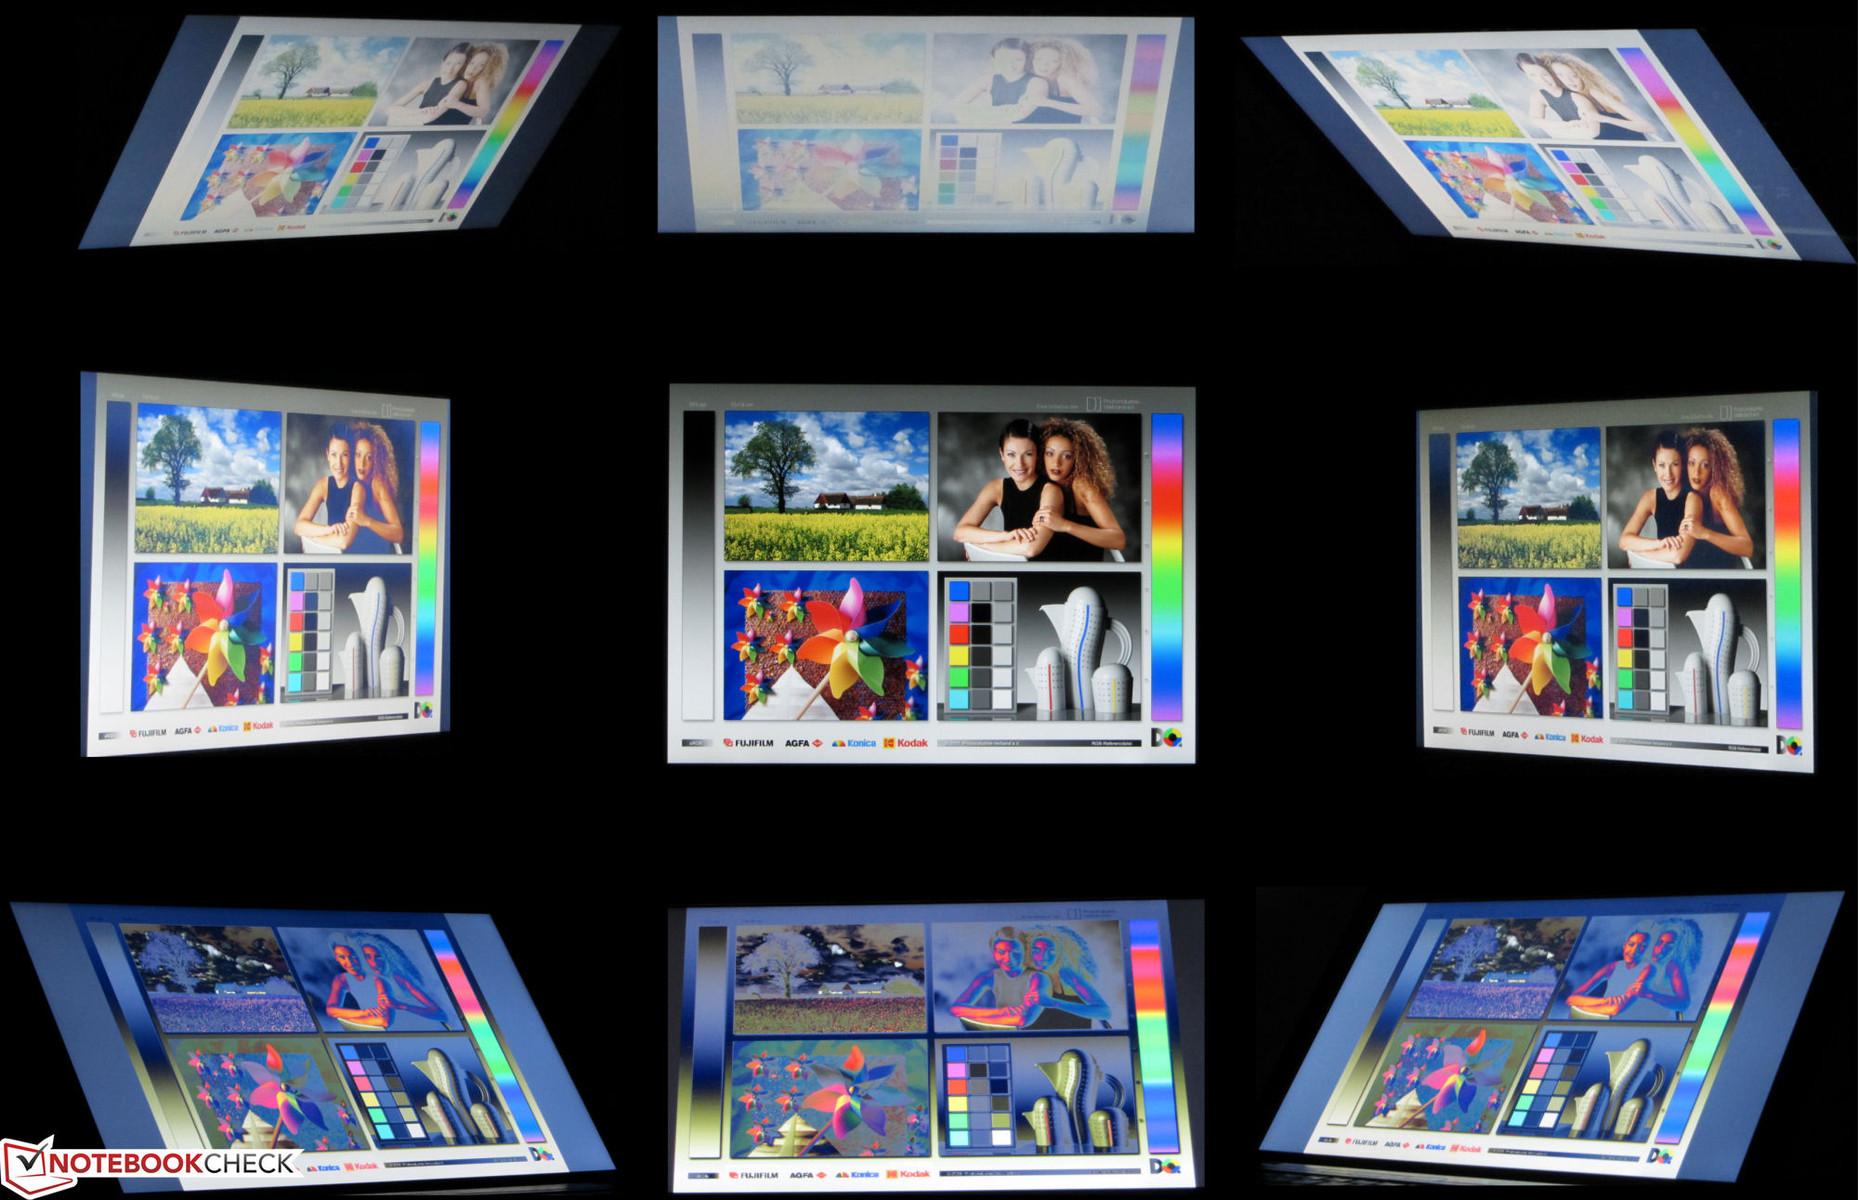 MSI CR42 2M Elantech Touchpad 64 Bit